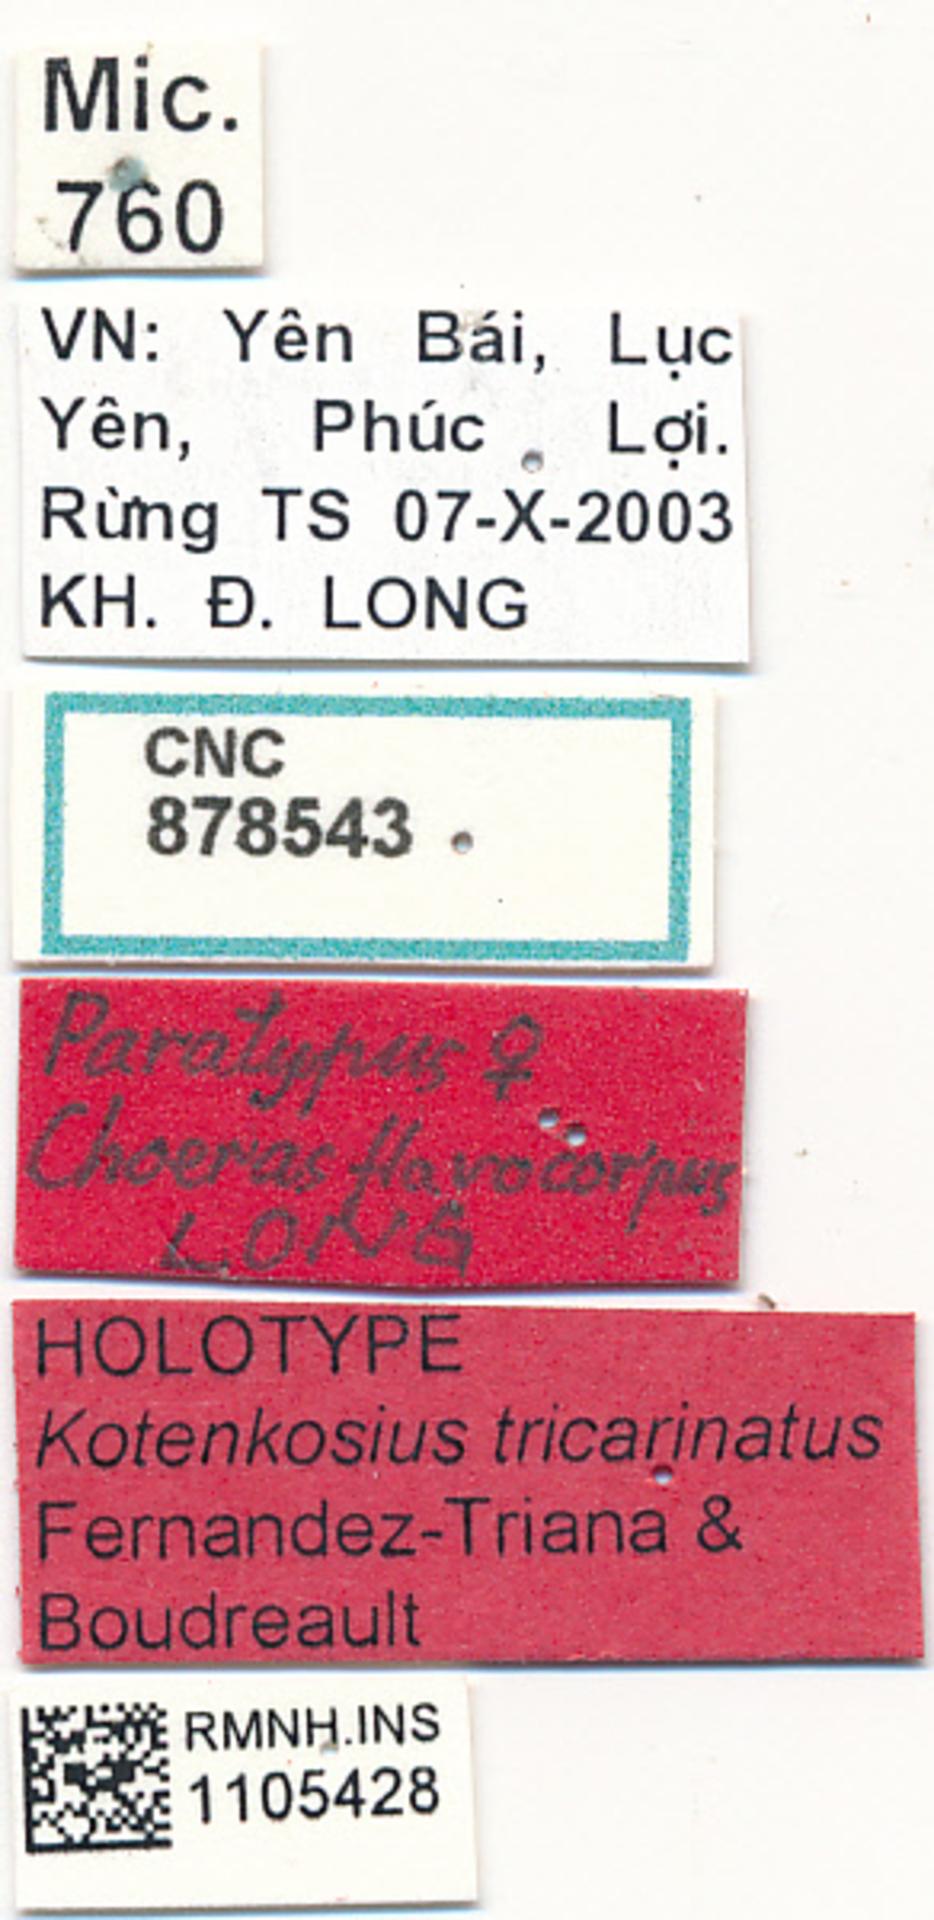 RMNH.INS.1105428 | Kotenkosius tricarinatus Fernandez-Triana & Boudreault, 2018